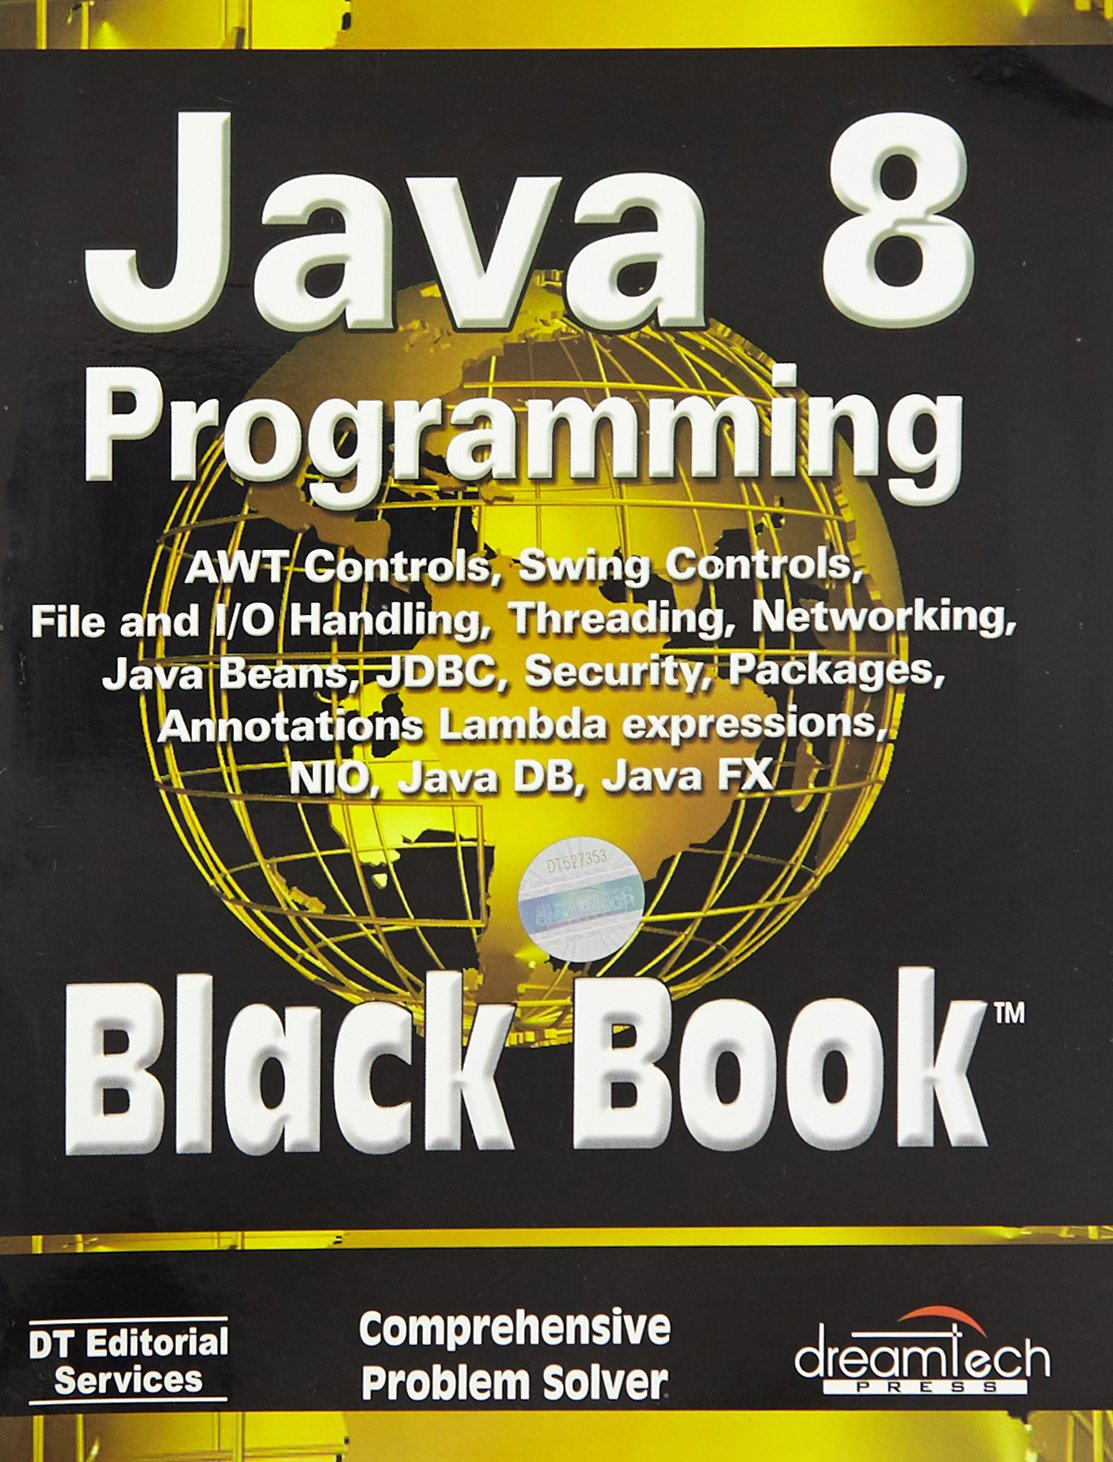 Buy Java 8 Programming Black Book Book Online at Low Prices in ...